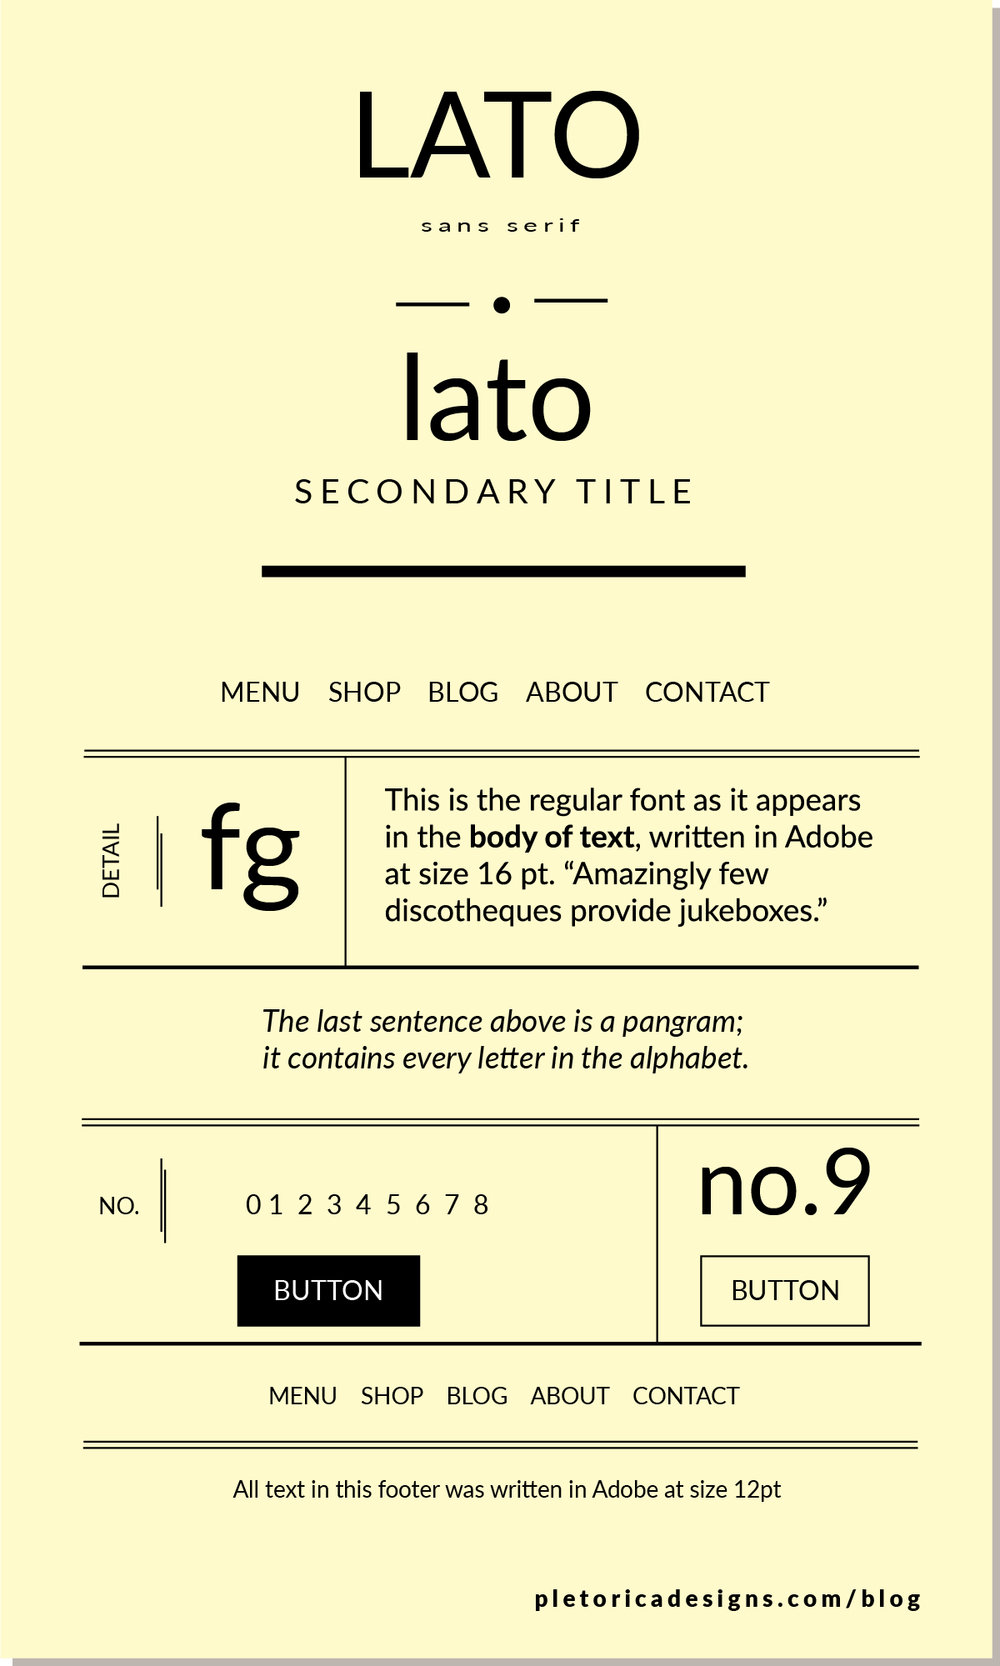 LET'S TYPE: Lato — PLETÓRICA DESIGNS